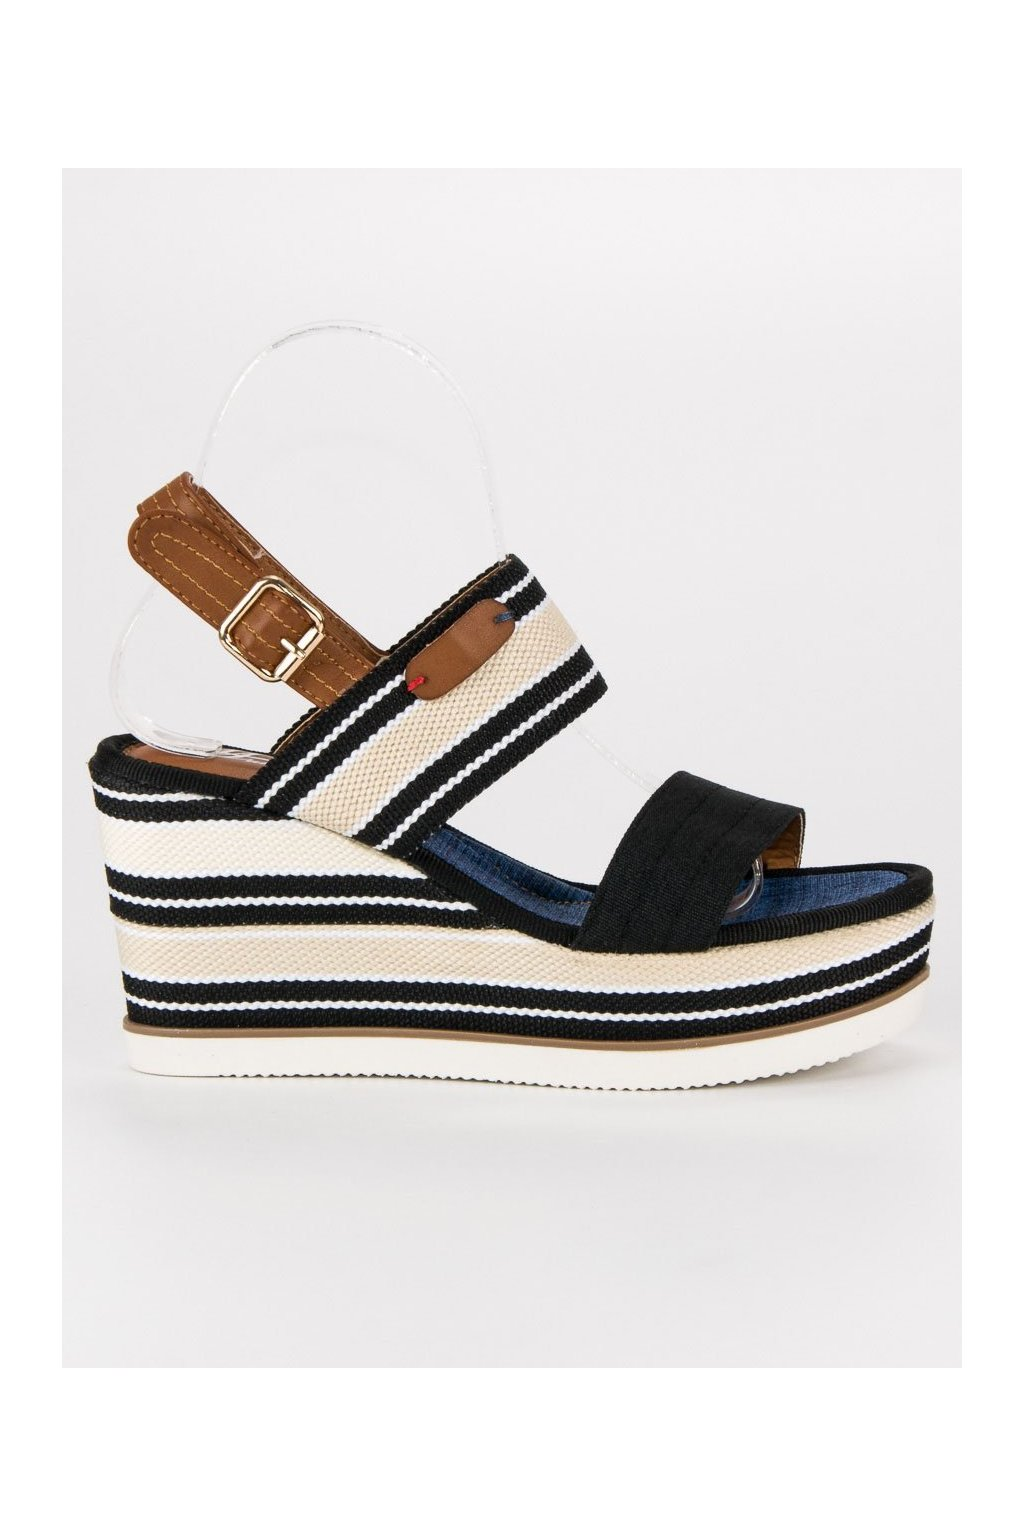 b249e54abb32 Sandále